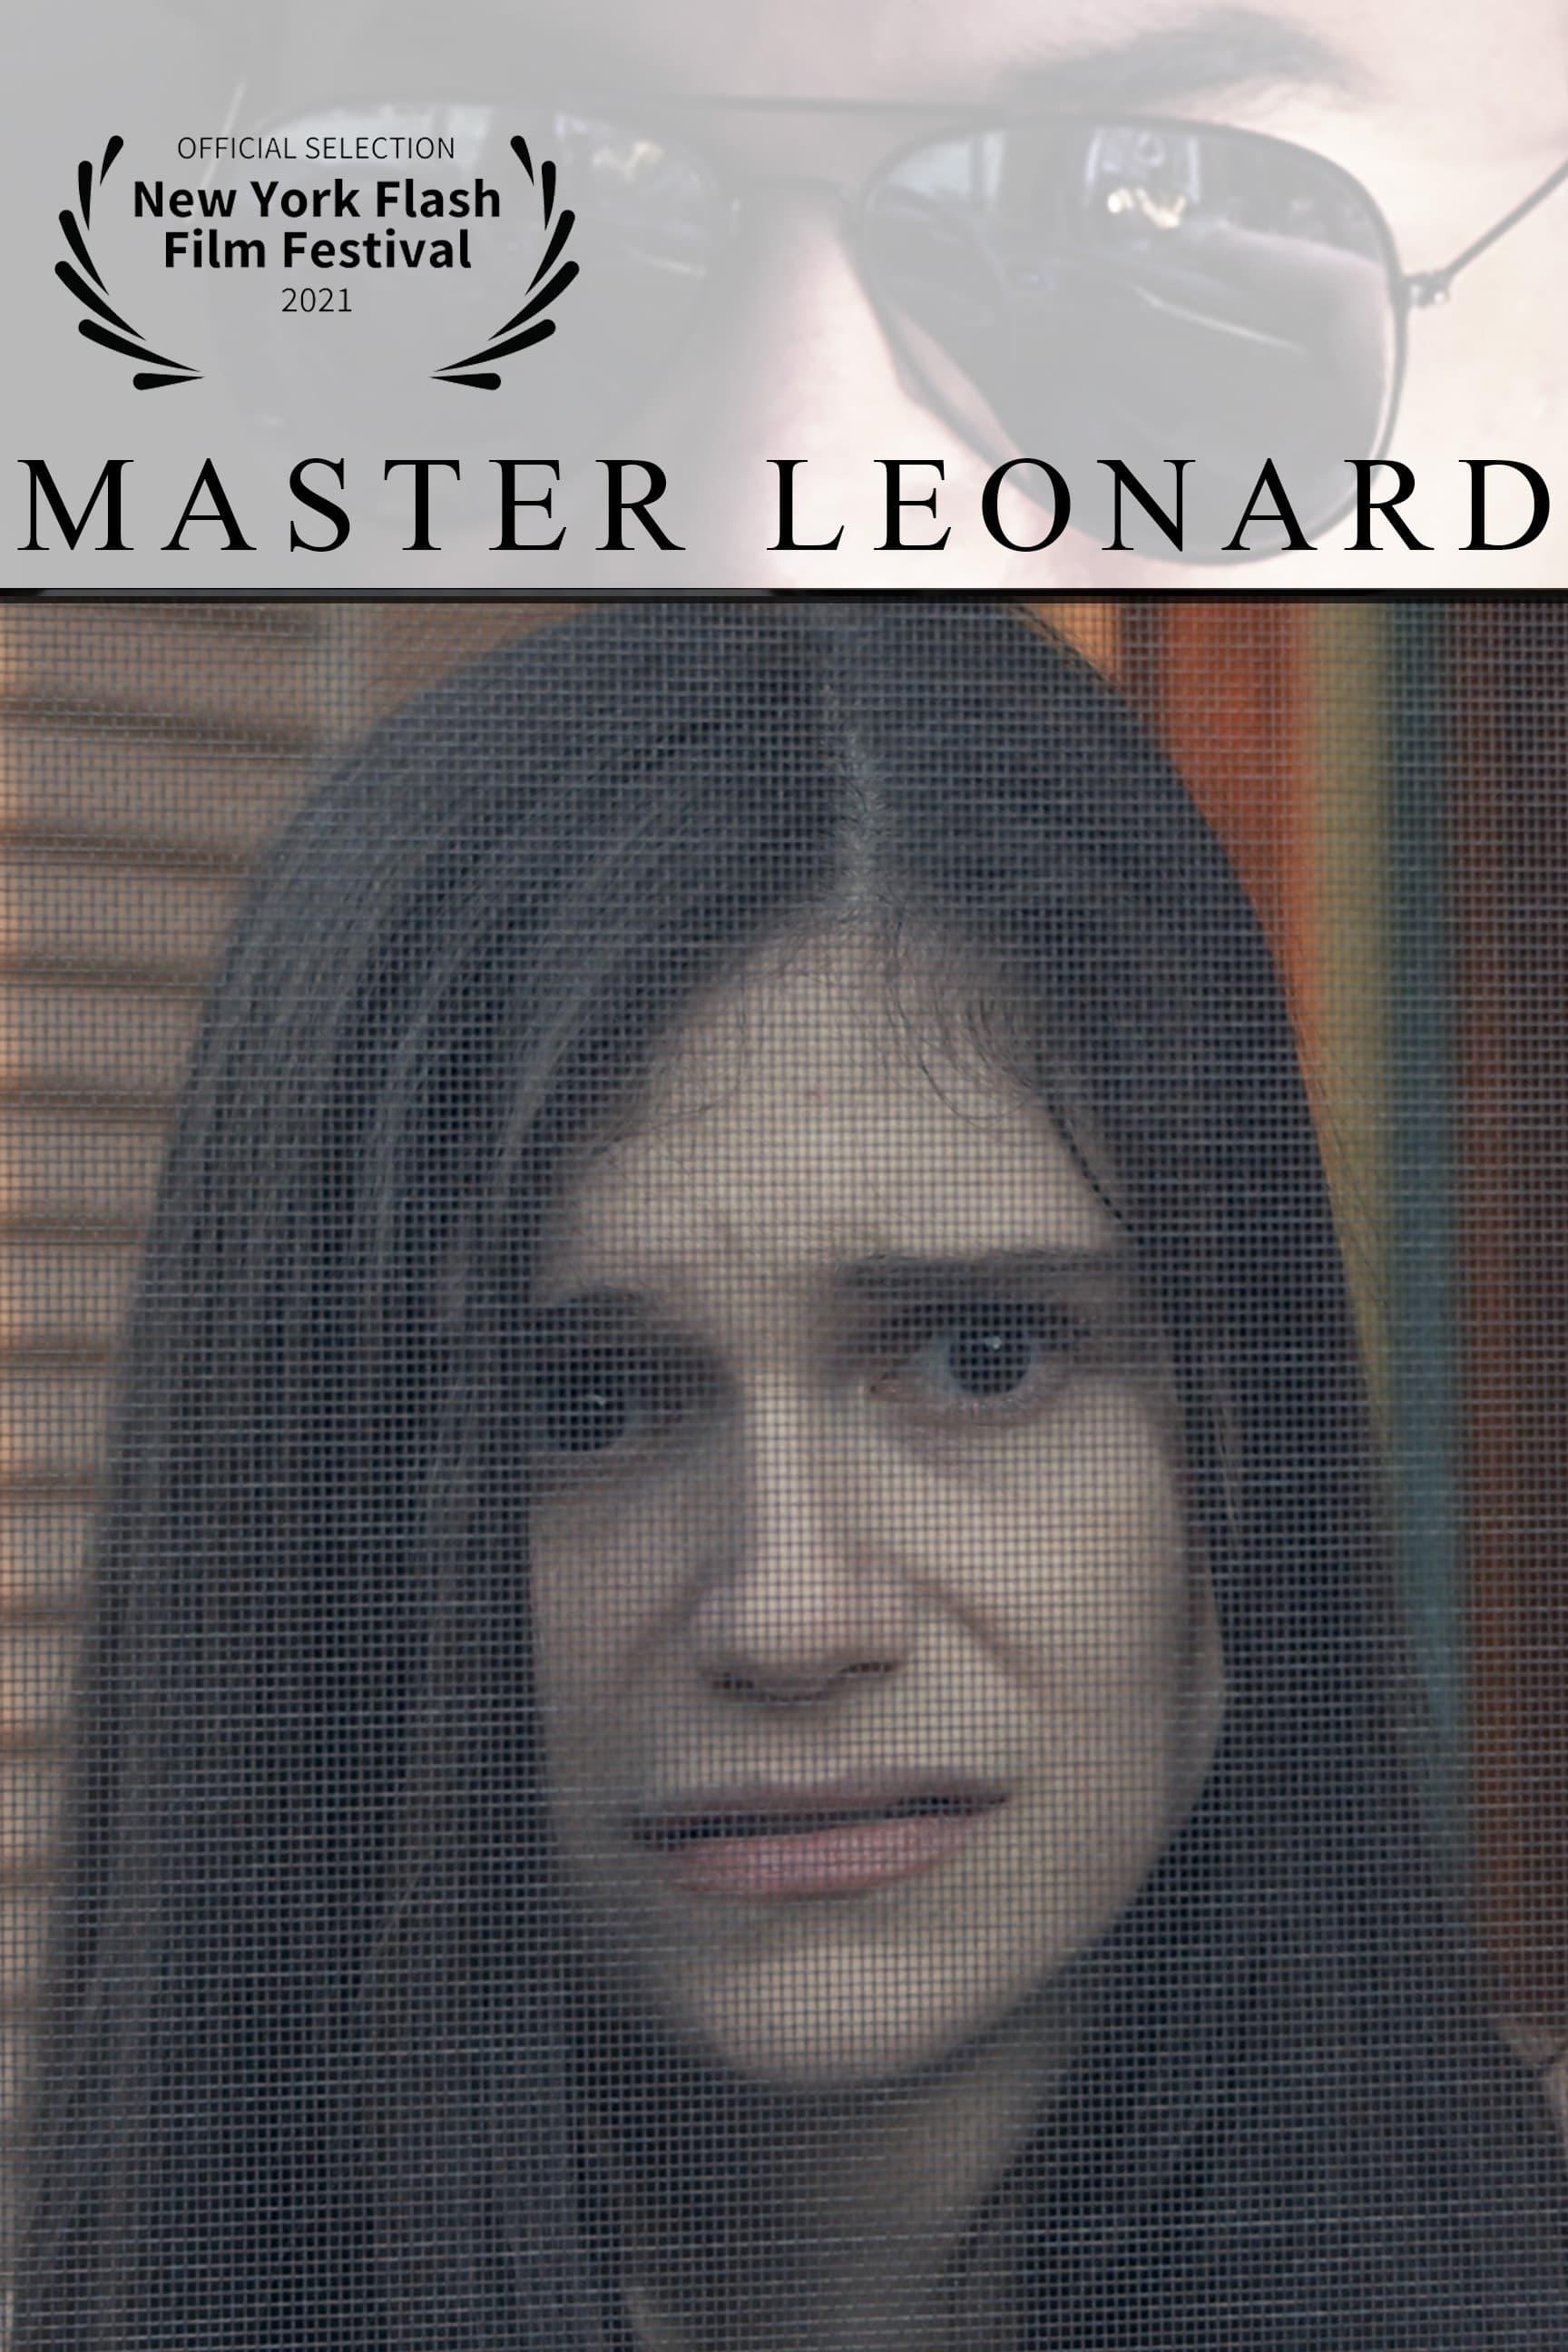 Master Leonard (2021)